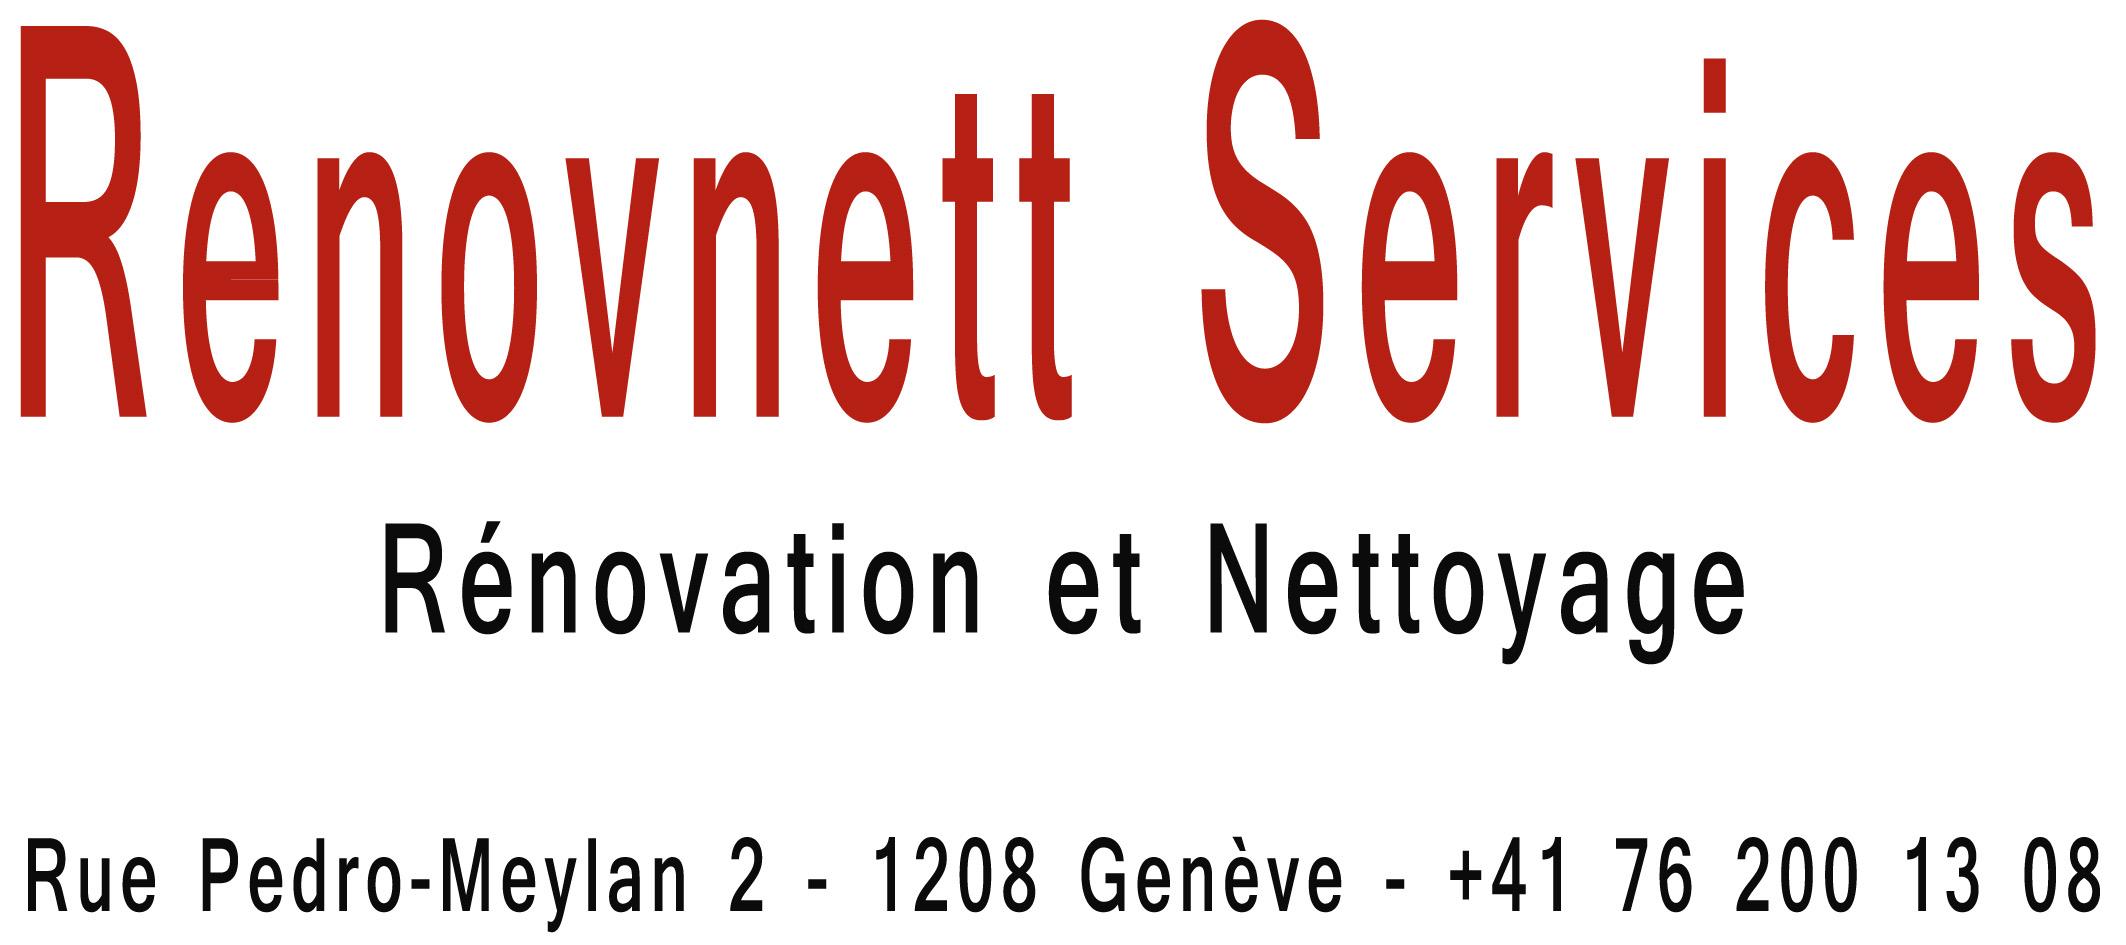 RENOVNETT SERVICES